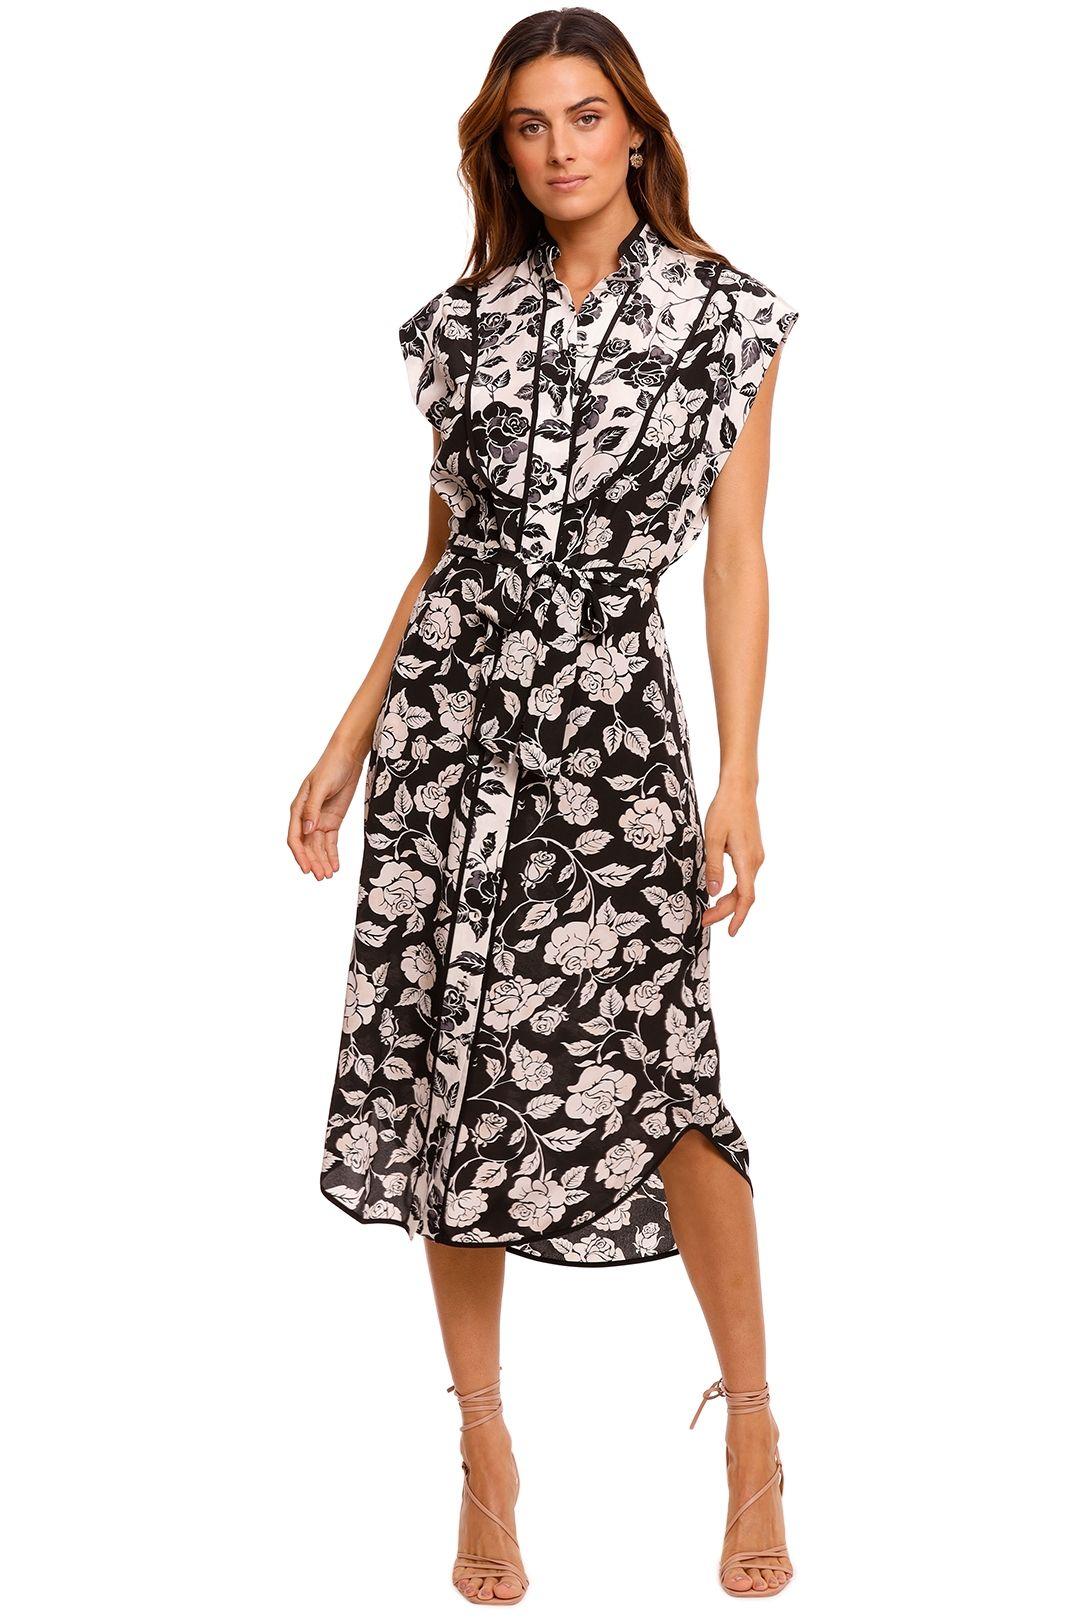 Zimmermann Silk Piped Dress